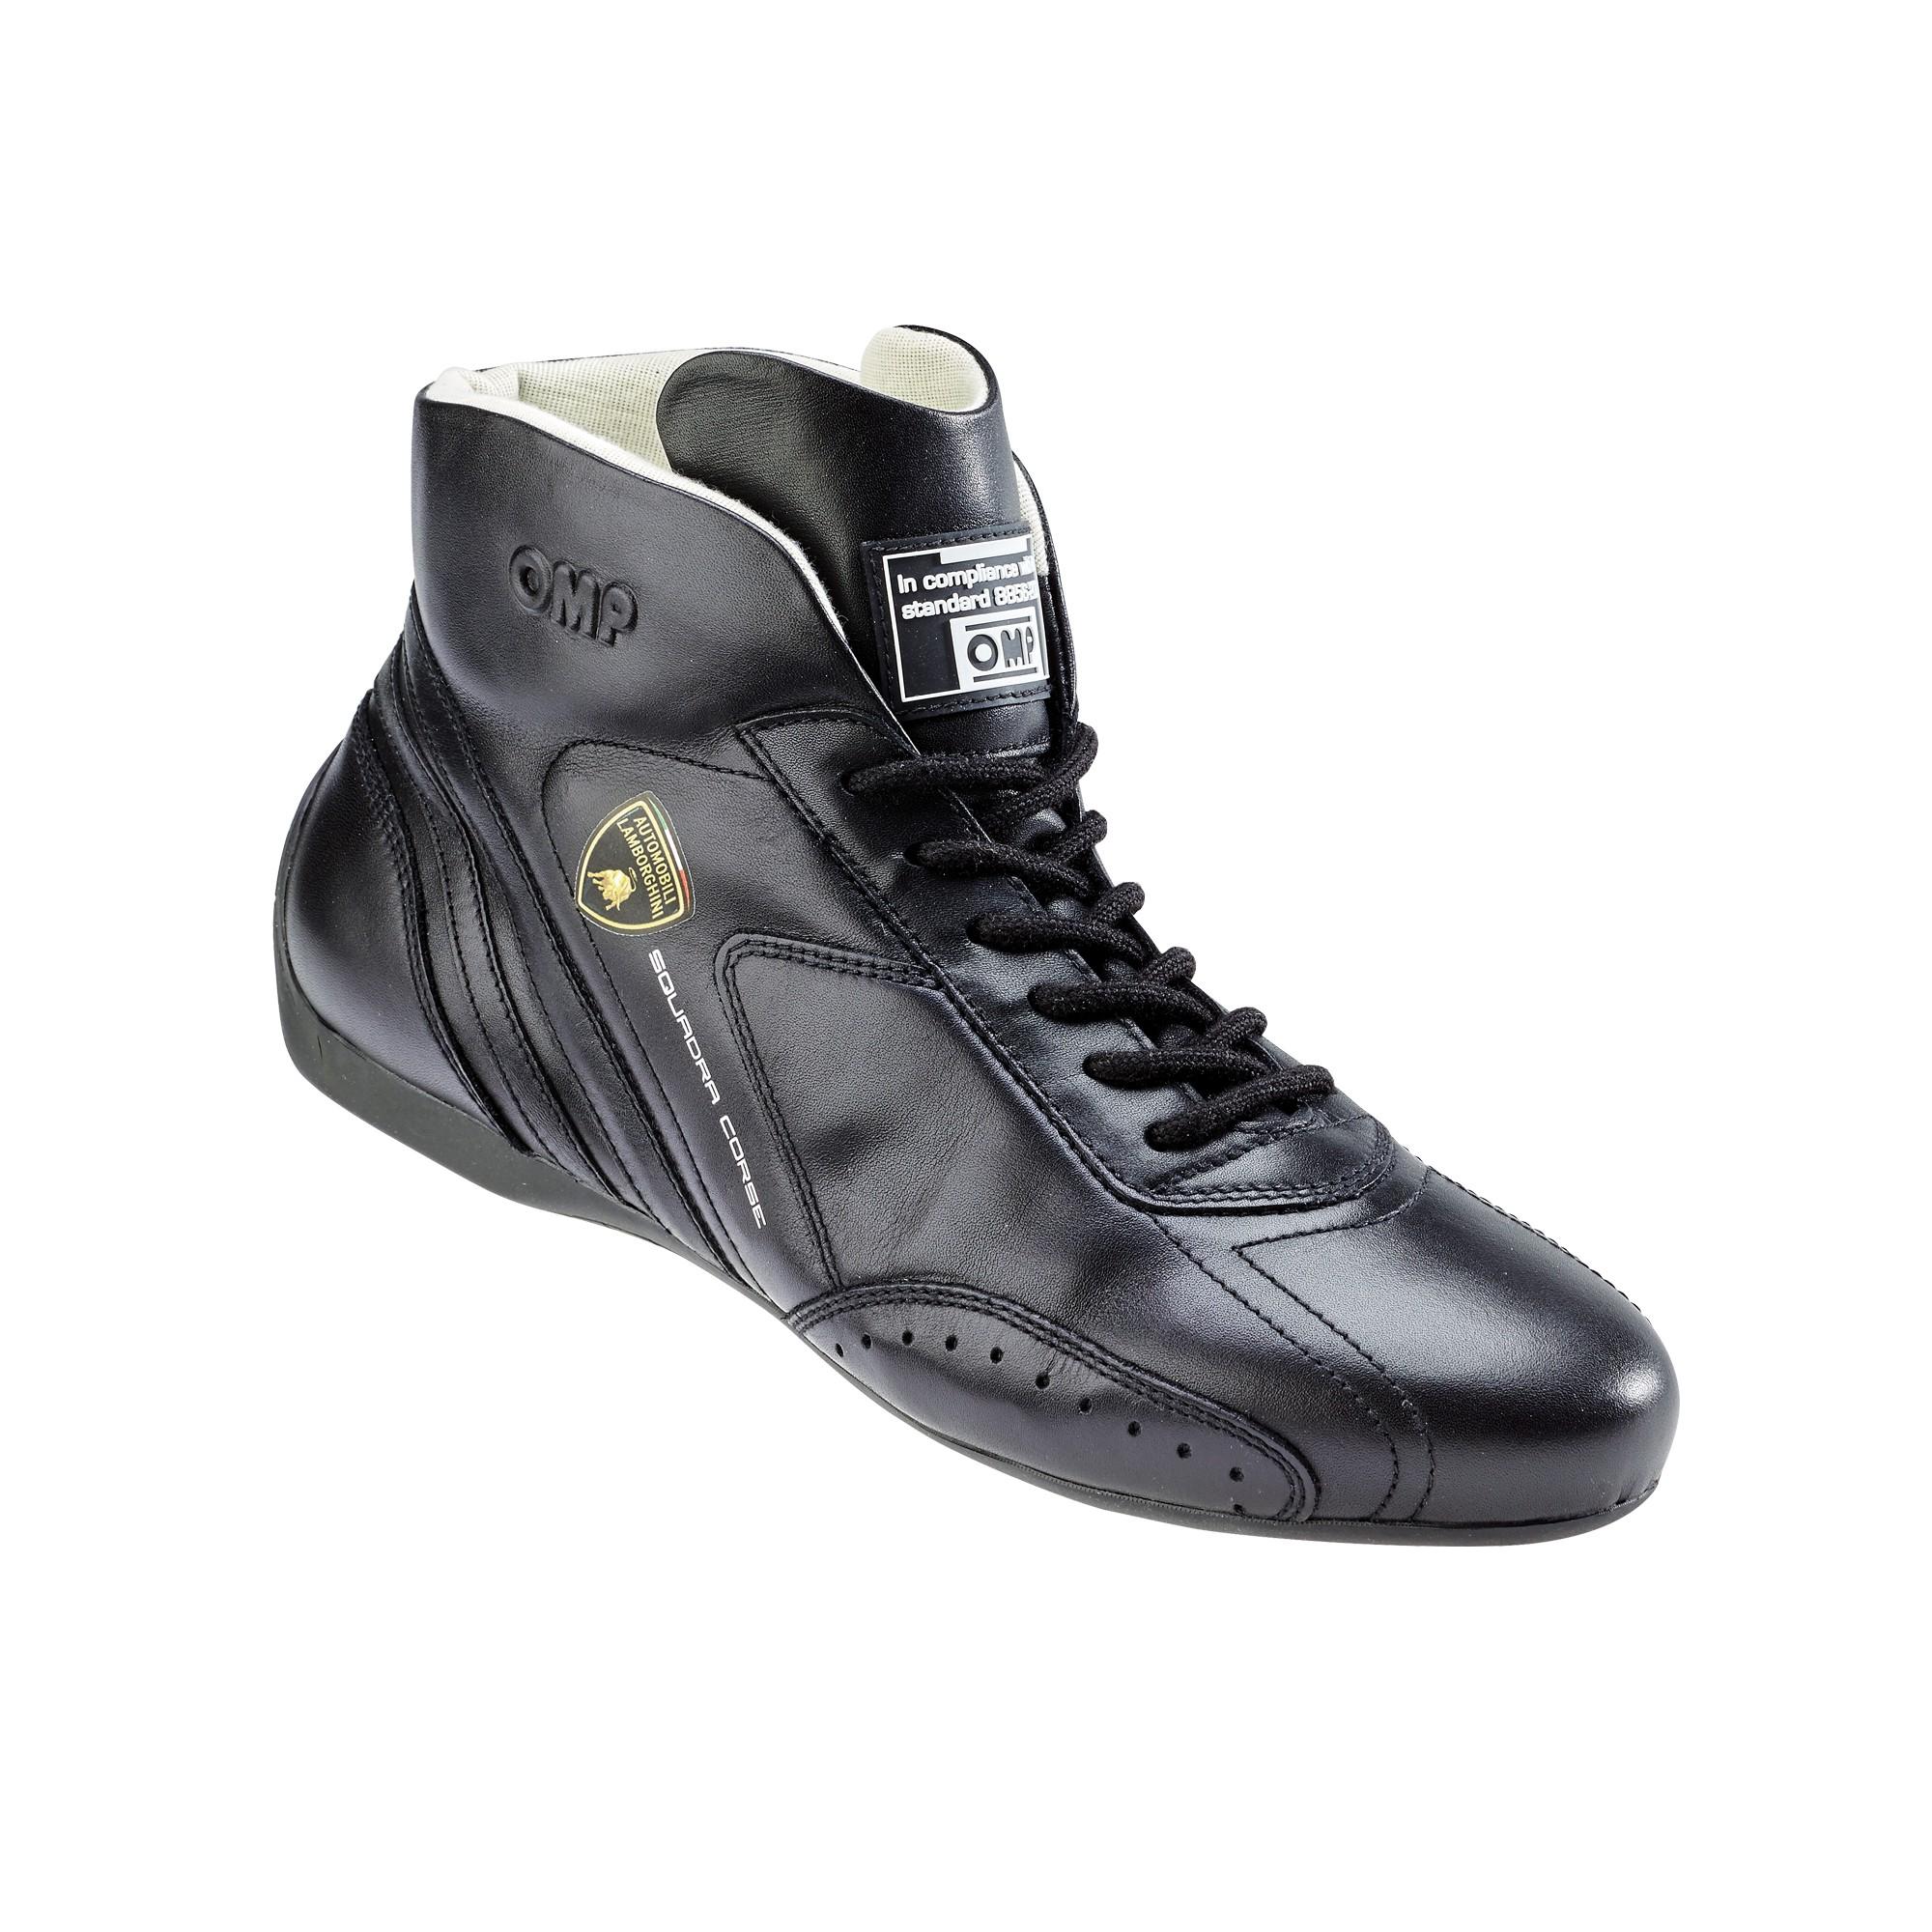 CARRERA Low Boots OMP AUTOMOBILI LAMBORGHINI